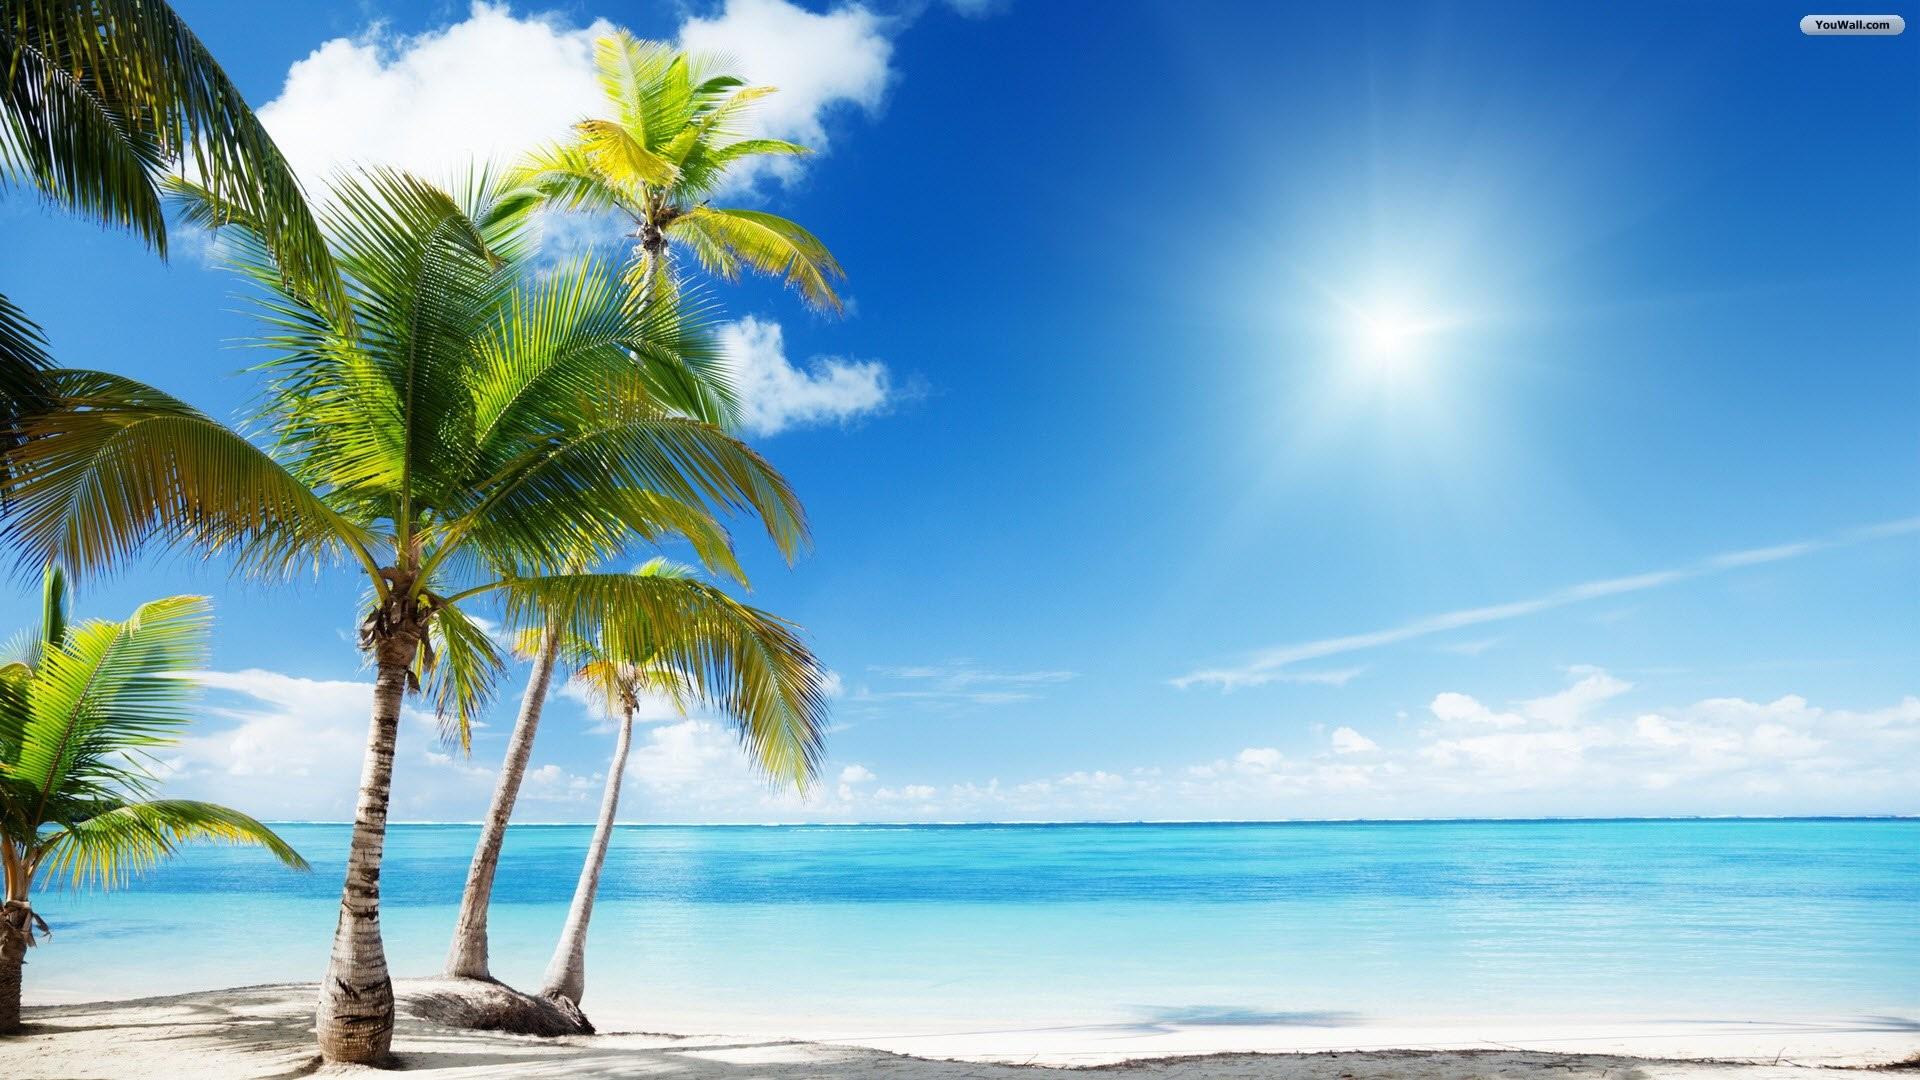 tropical beach scenes wallpaper 49 images